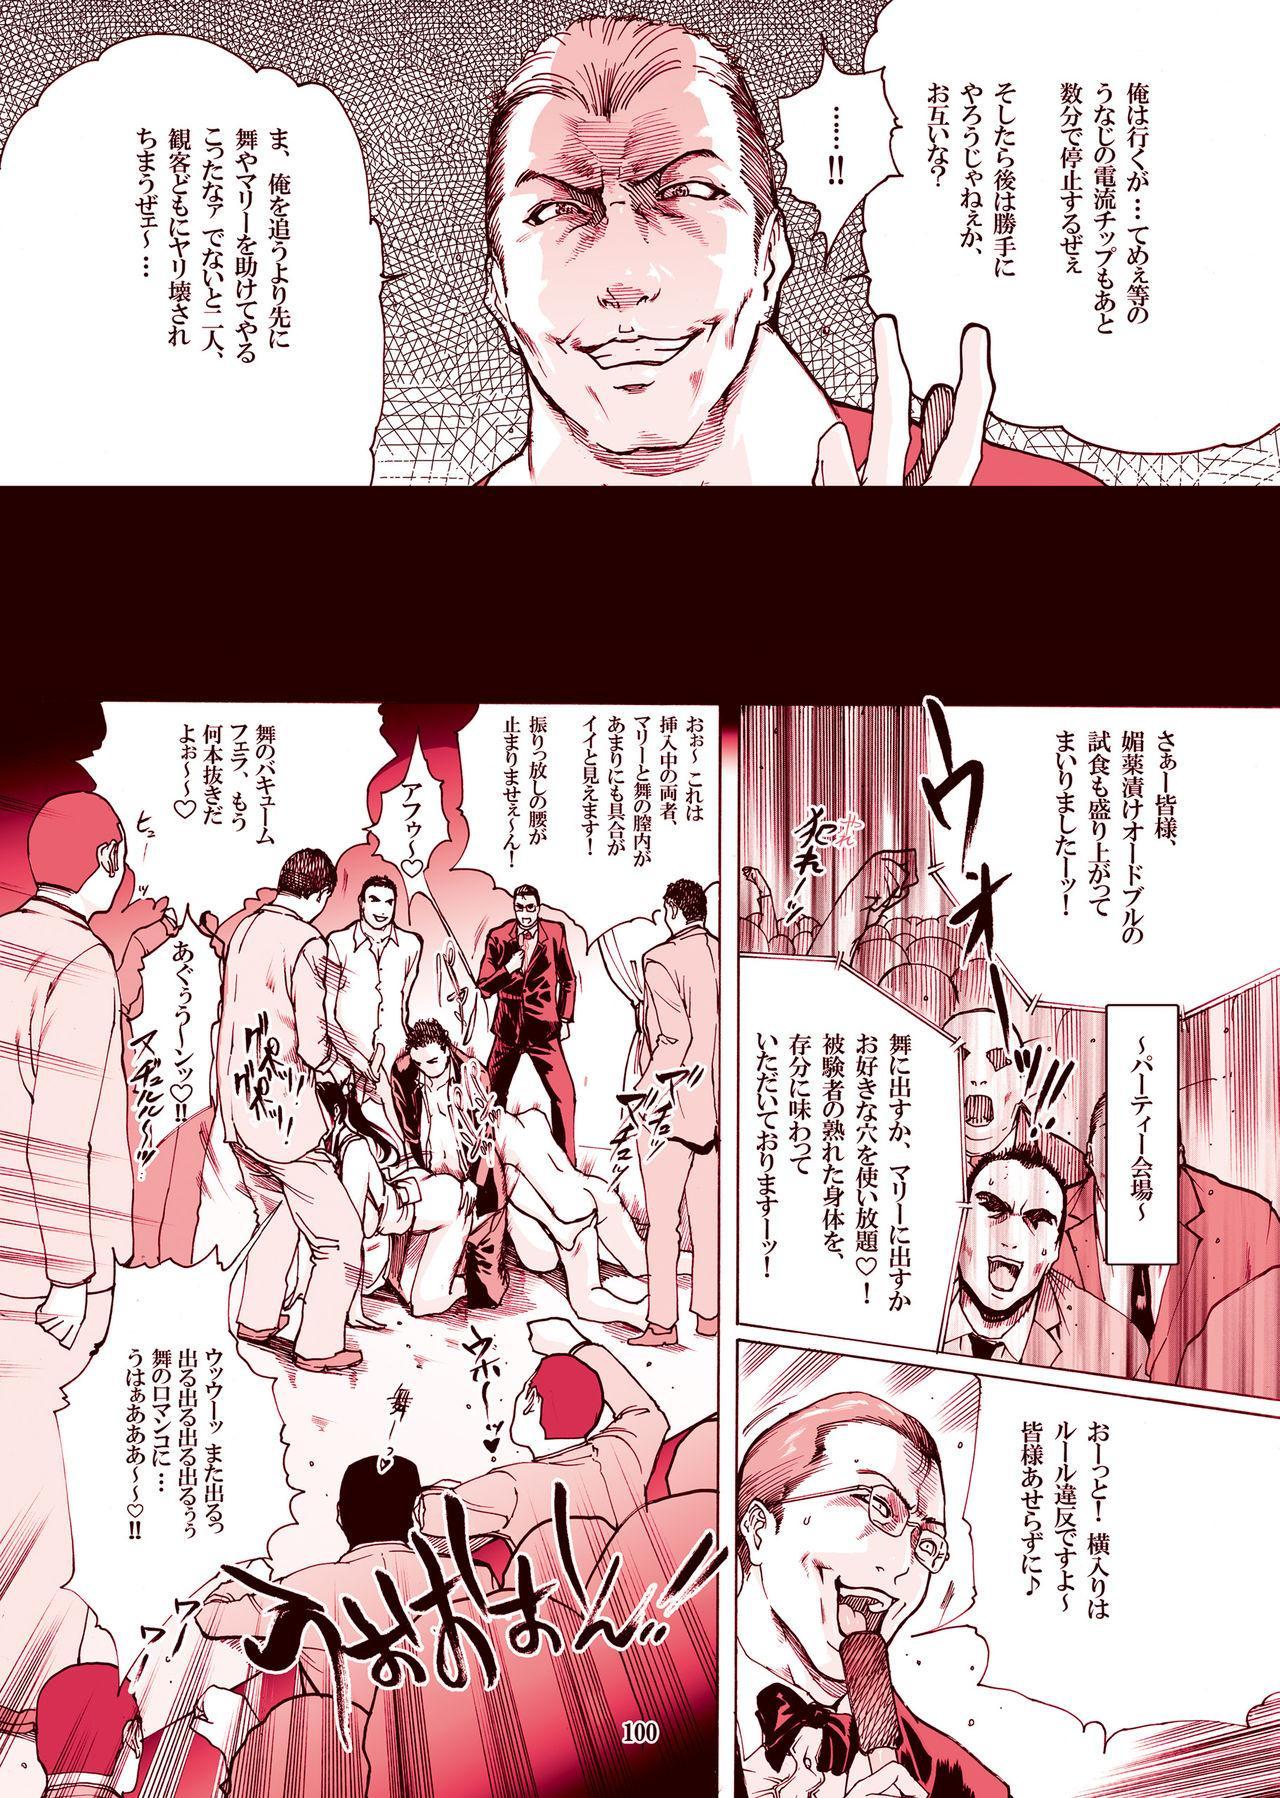 [LINDA]「舞ing(まいっちんぐ)完全版」サンプル●不知火舞 97